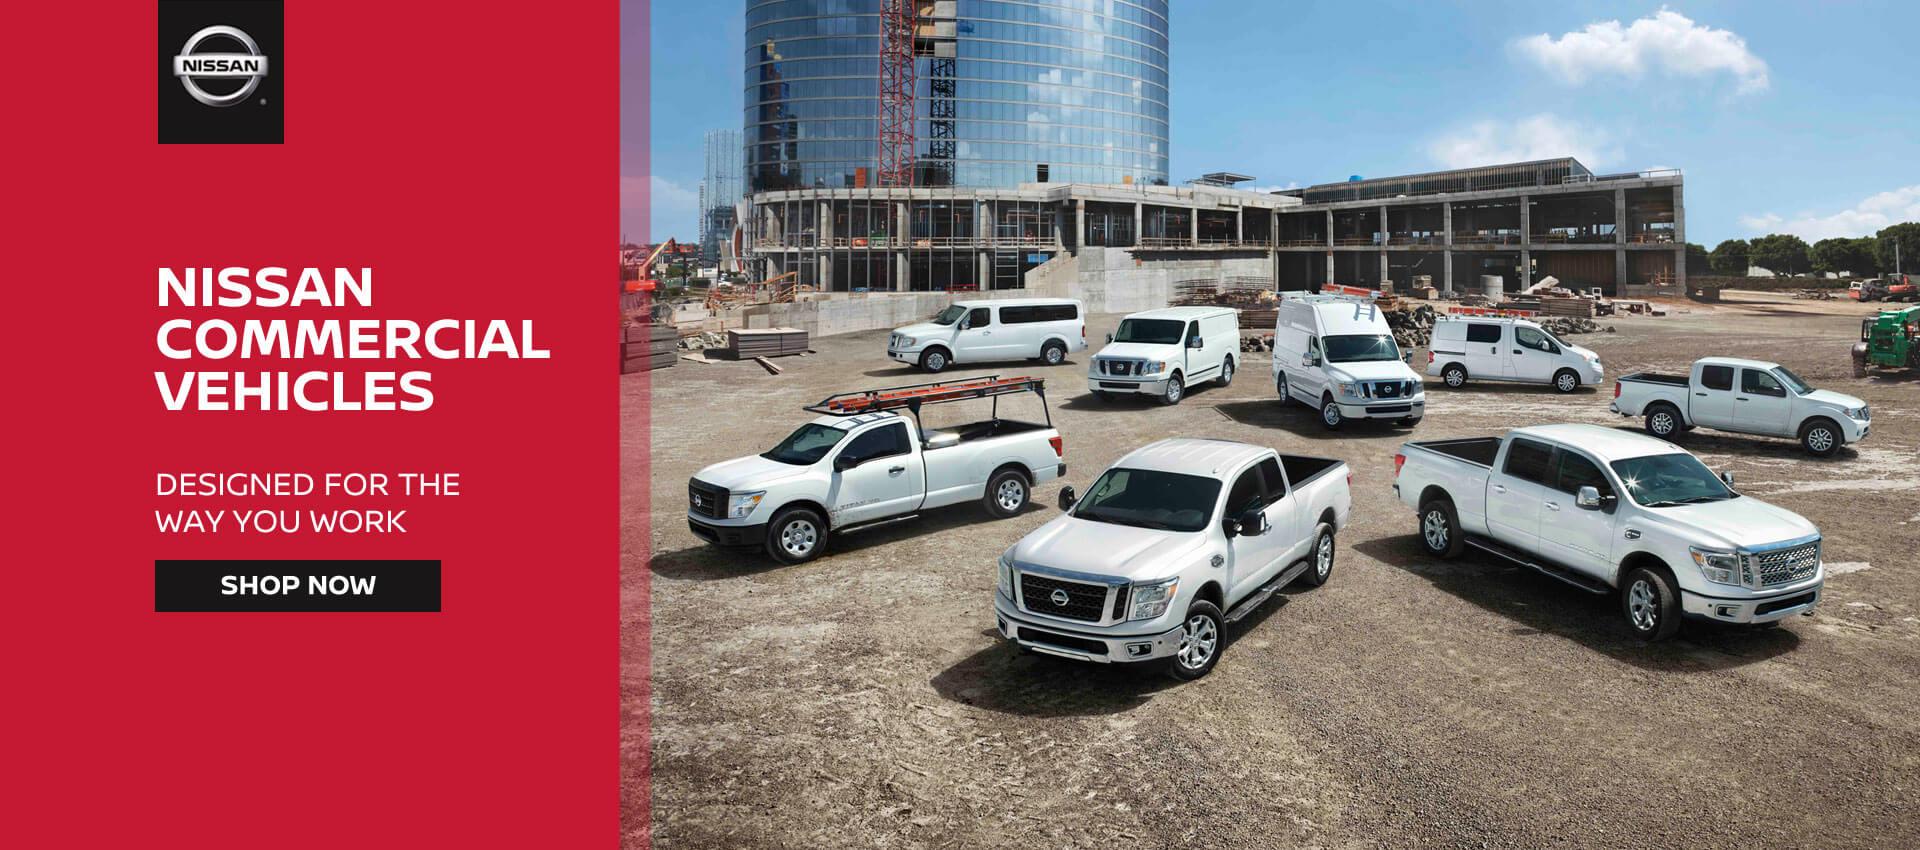 Nissan Dealers In Delaware >> New Used Nissan Dealer In South Jersey Serving